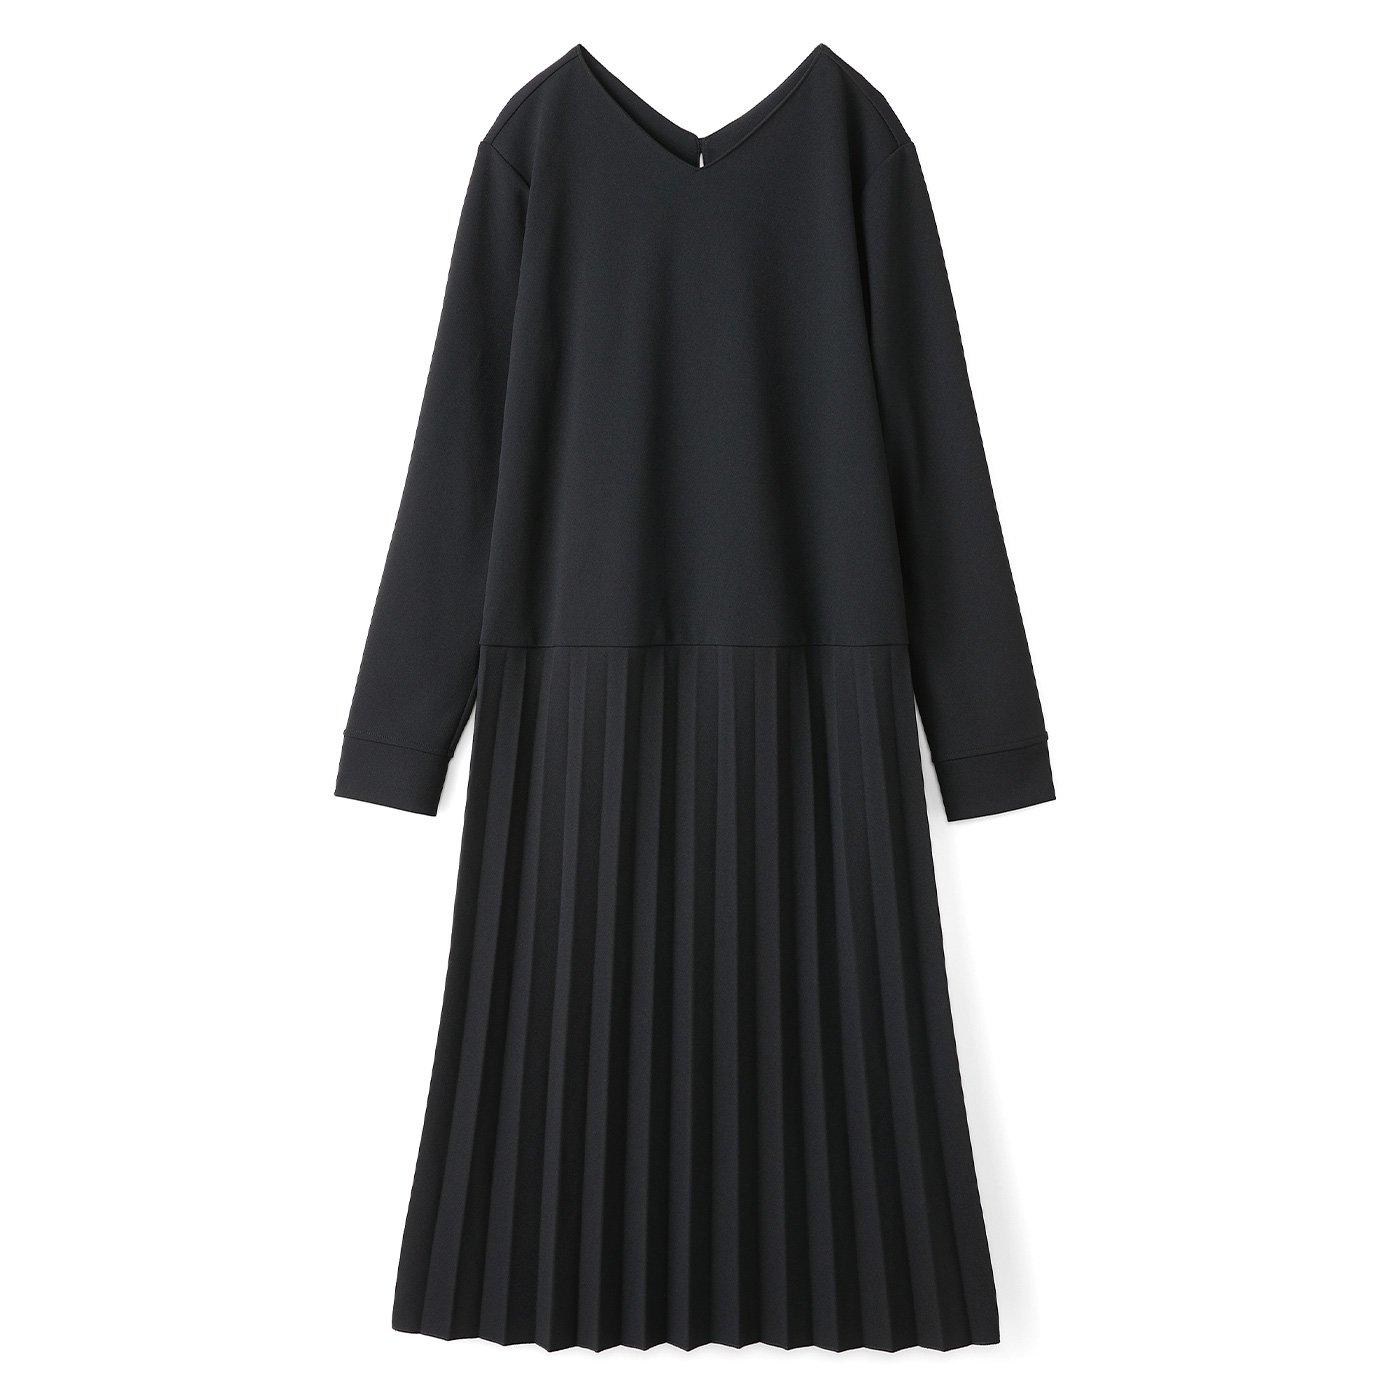 IEDIT[イディット] イージーな着心地で上品スタイルがかなうプリーツ切り替えワンピース〈ブラック〉